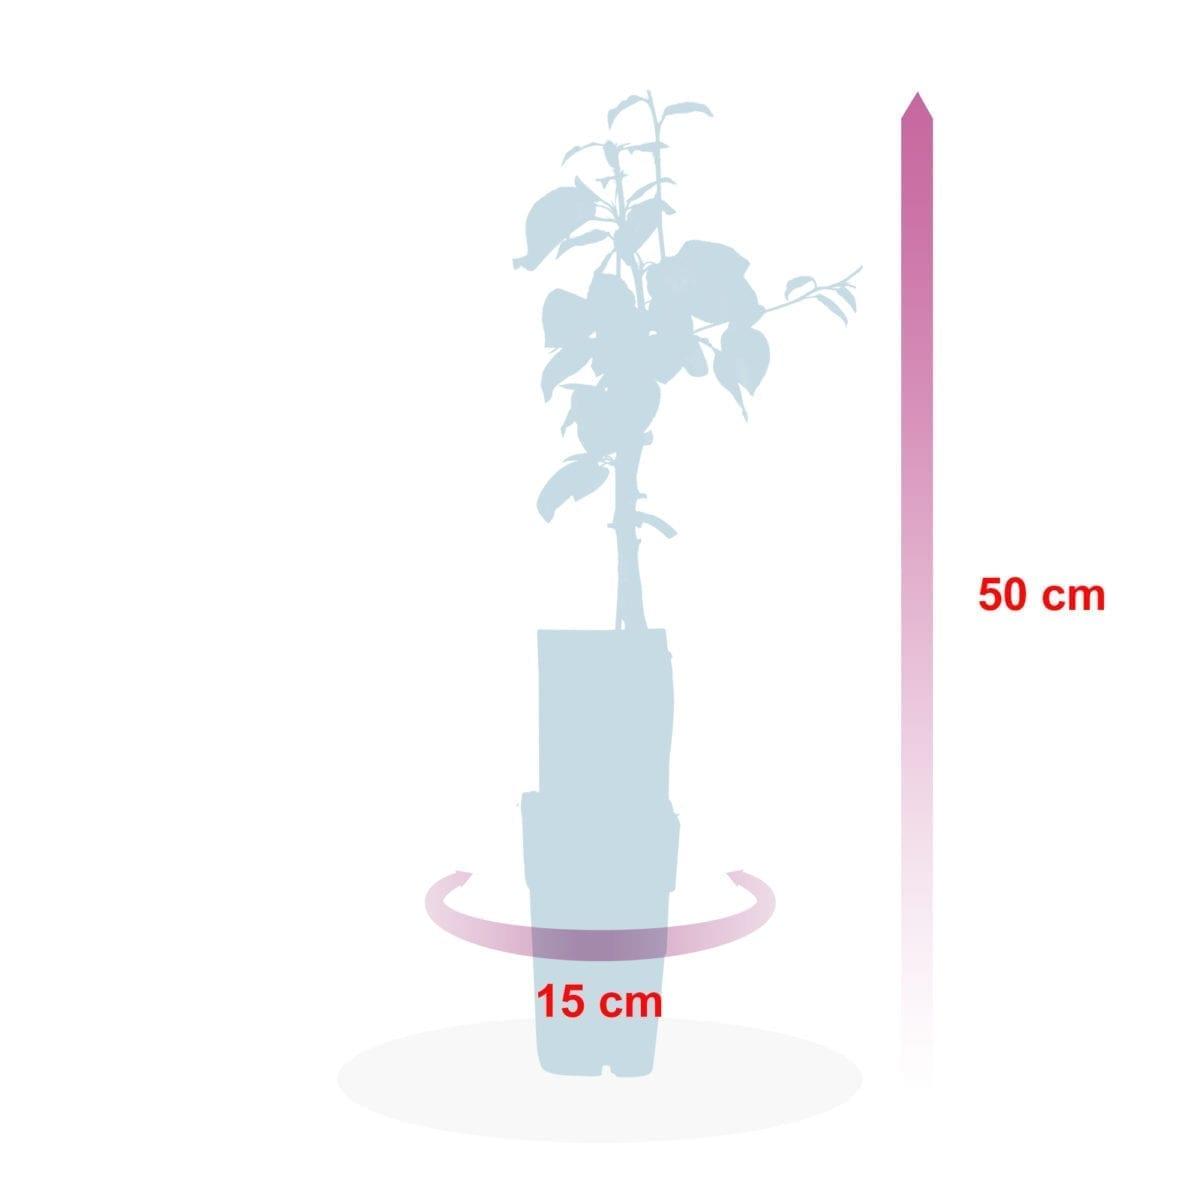 boskoopsefruitbomen | Pruim afmeting